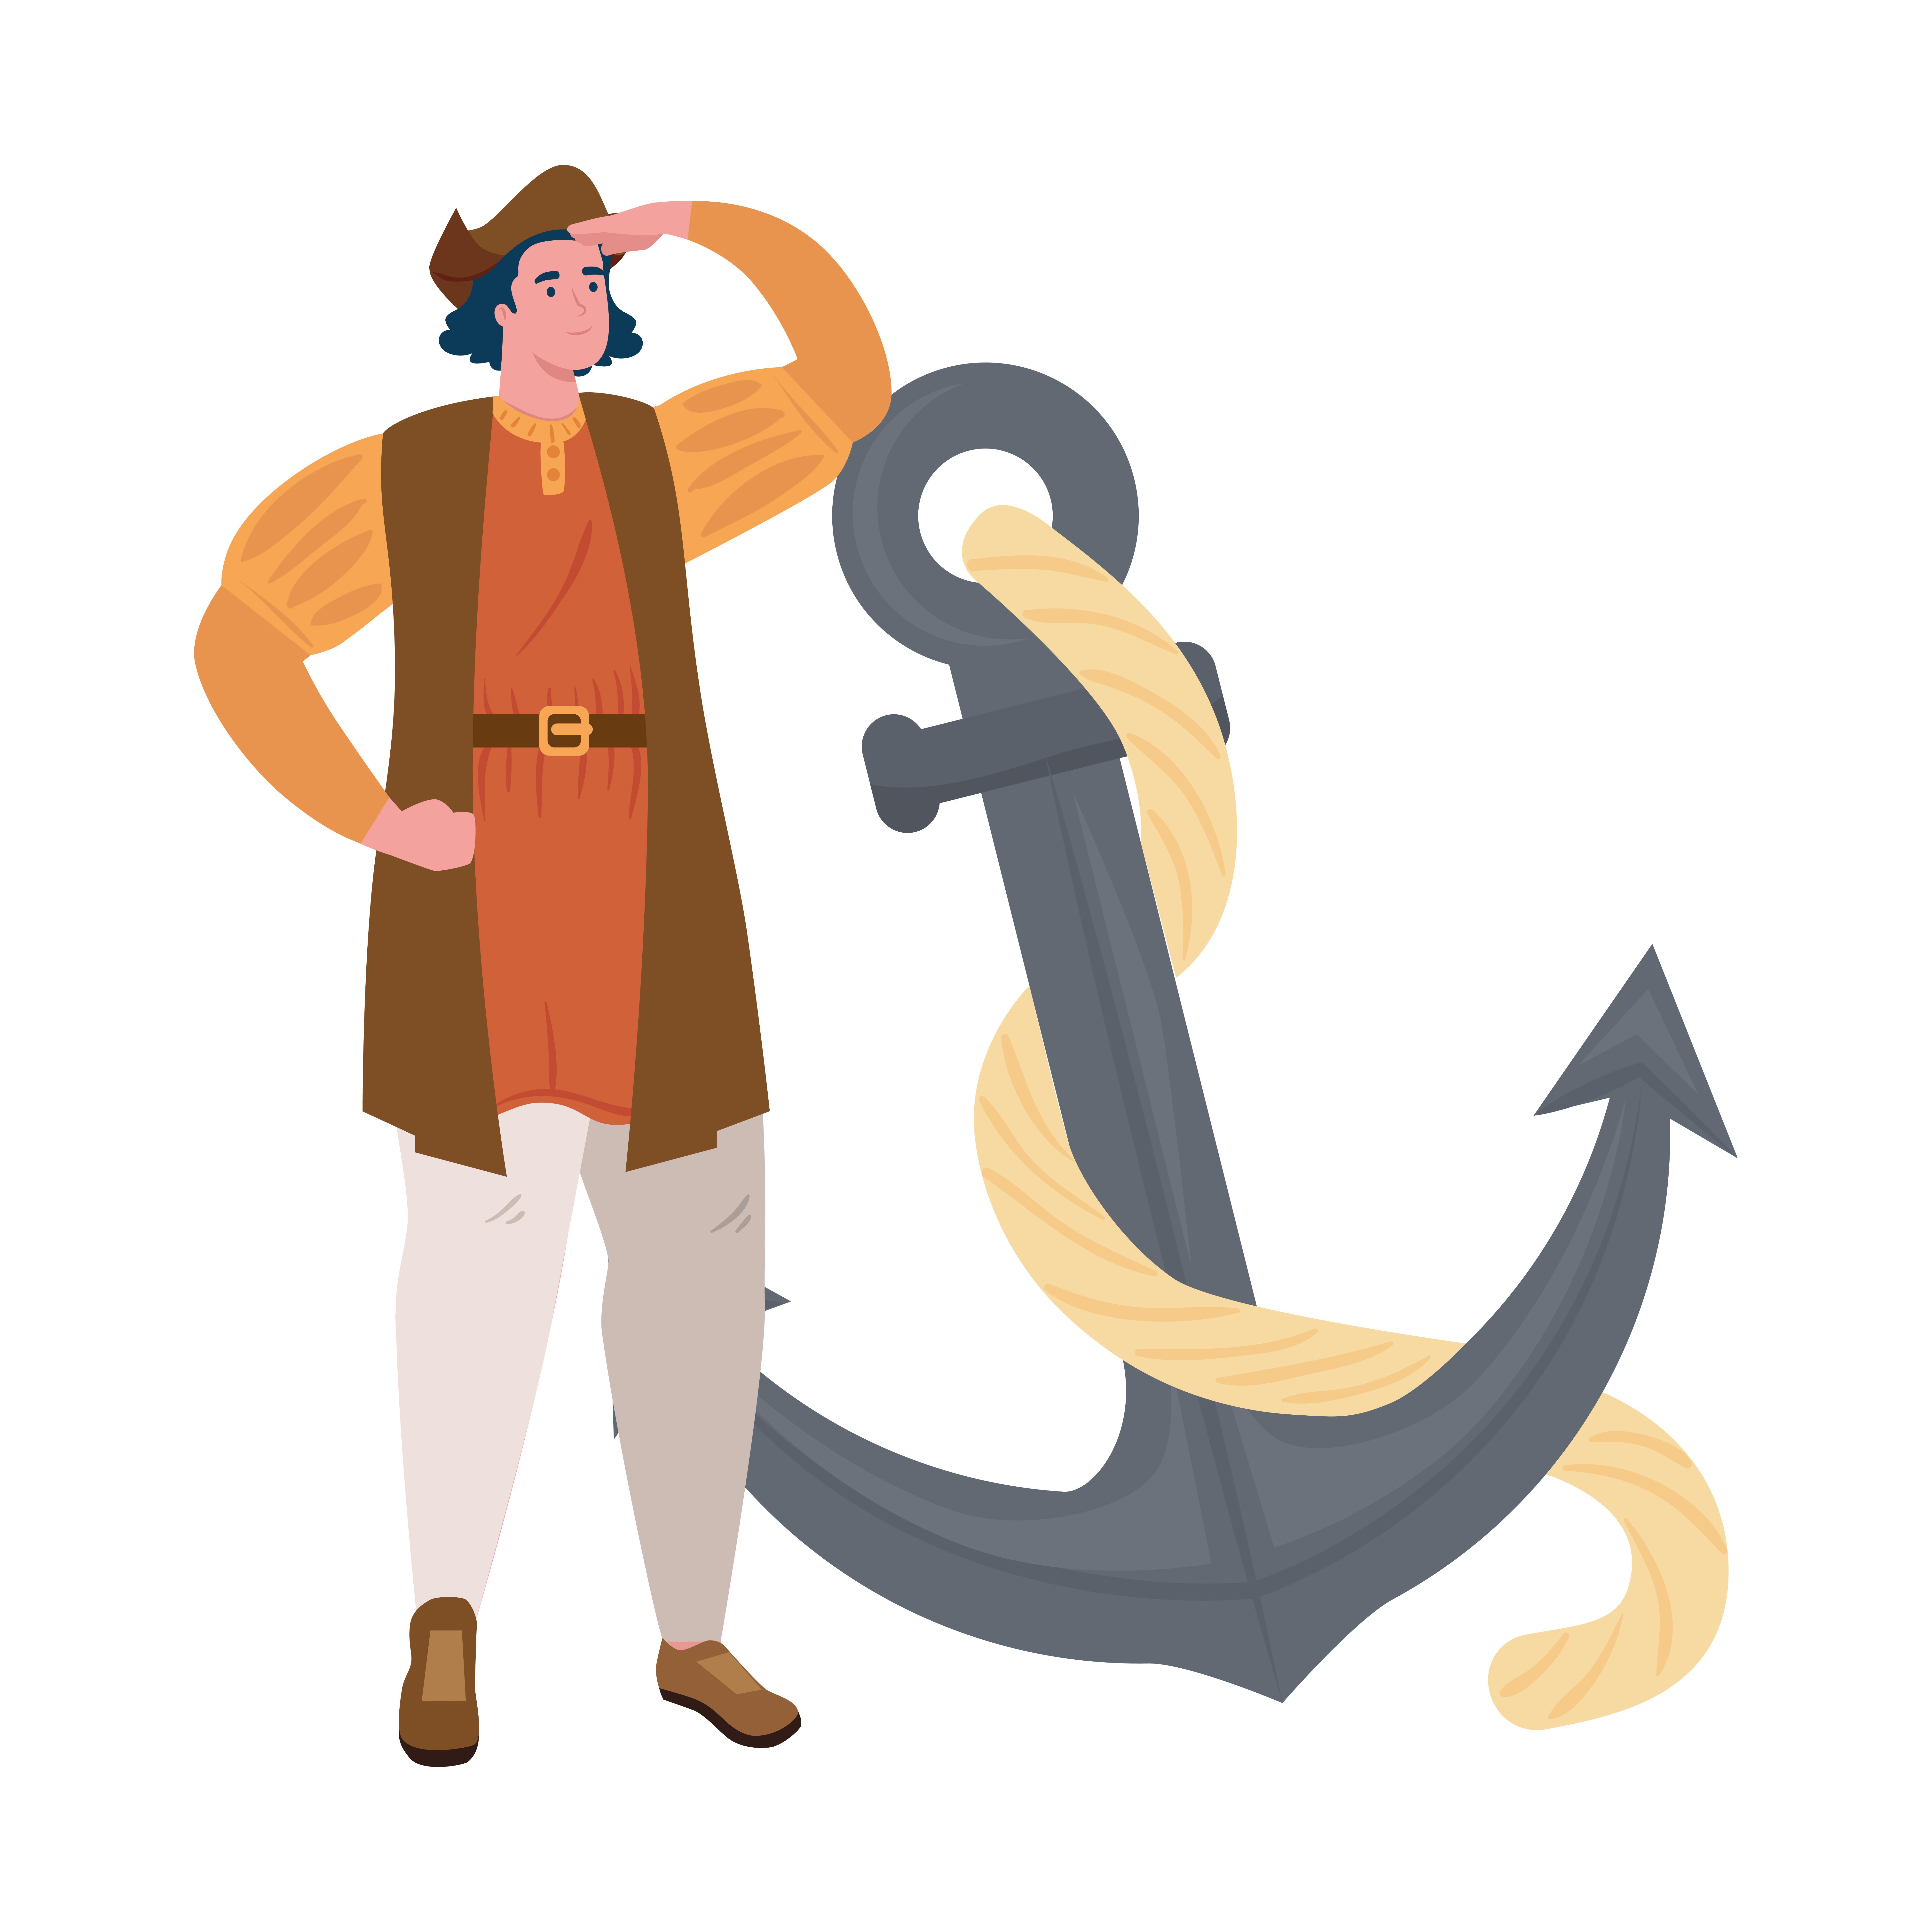 Christopher Columbus Cartoon With Anchor Vector Design Download Free Vectors Clipart Graphics Vector Art